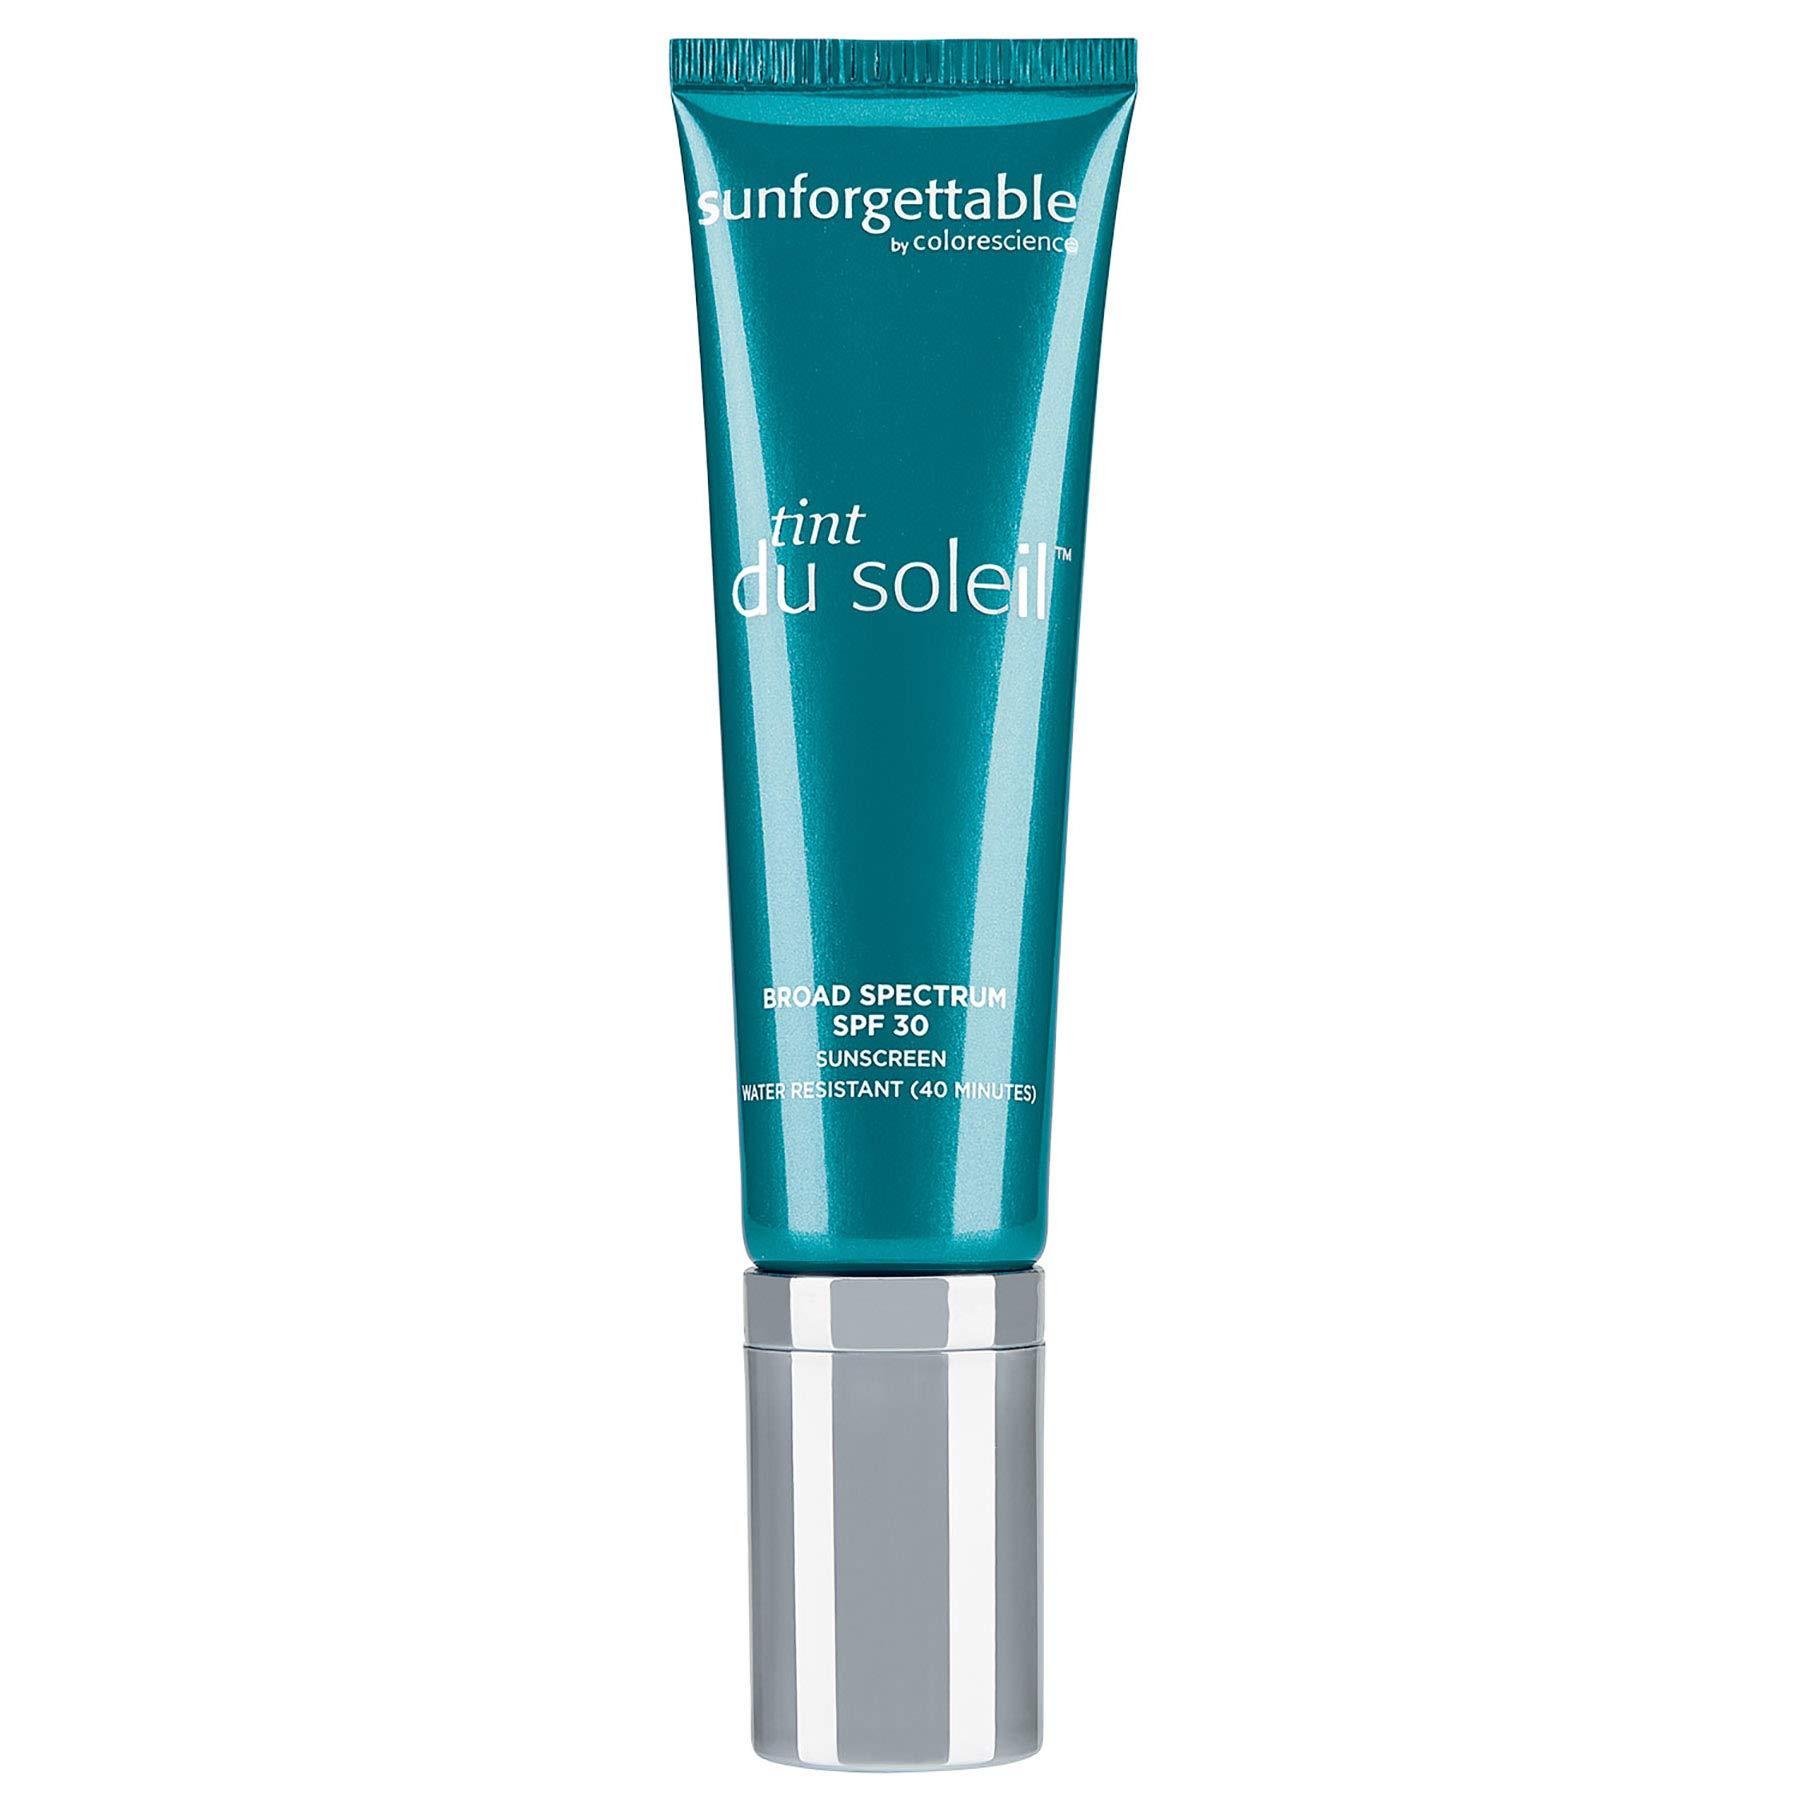 Colorescience Mineral Sunscreen Foundation, Tint du Soleil, For Sensitive Skin - Broad Spectrum SPF 30 Protection